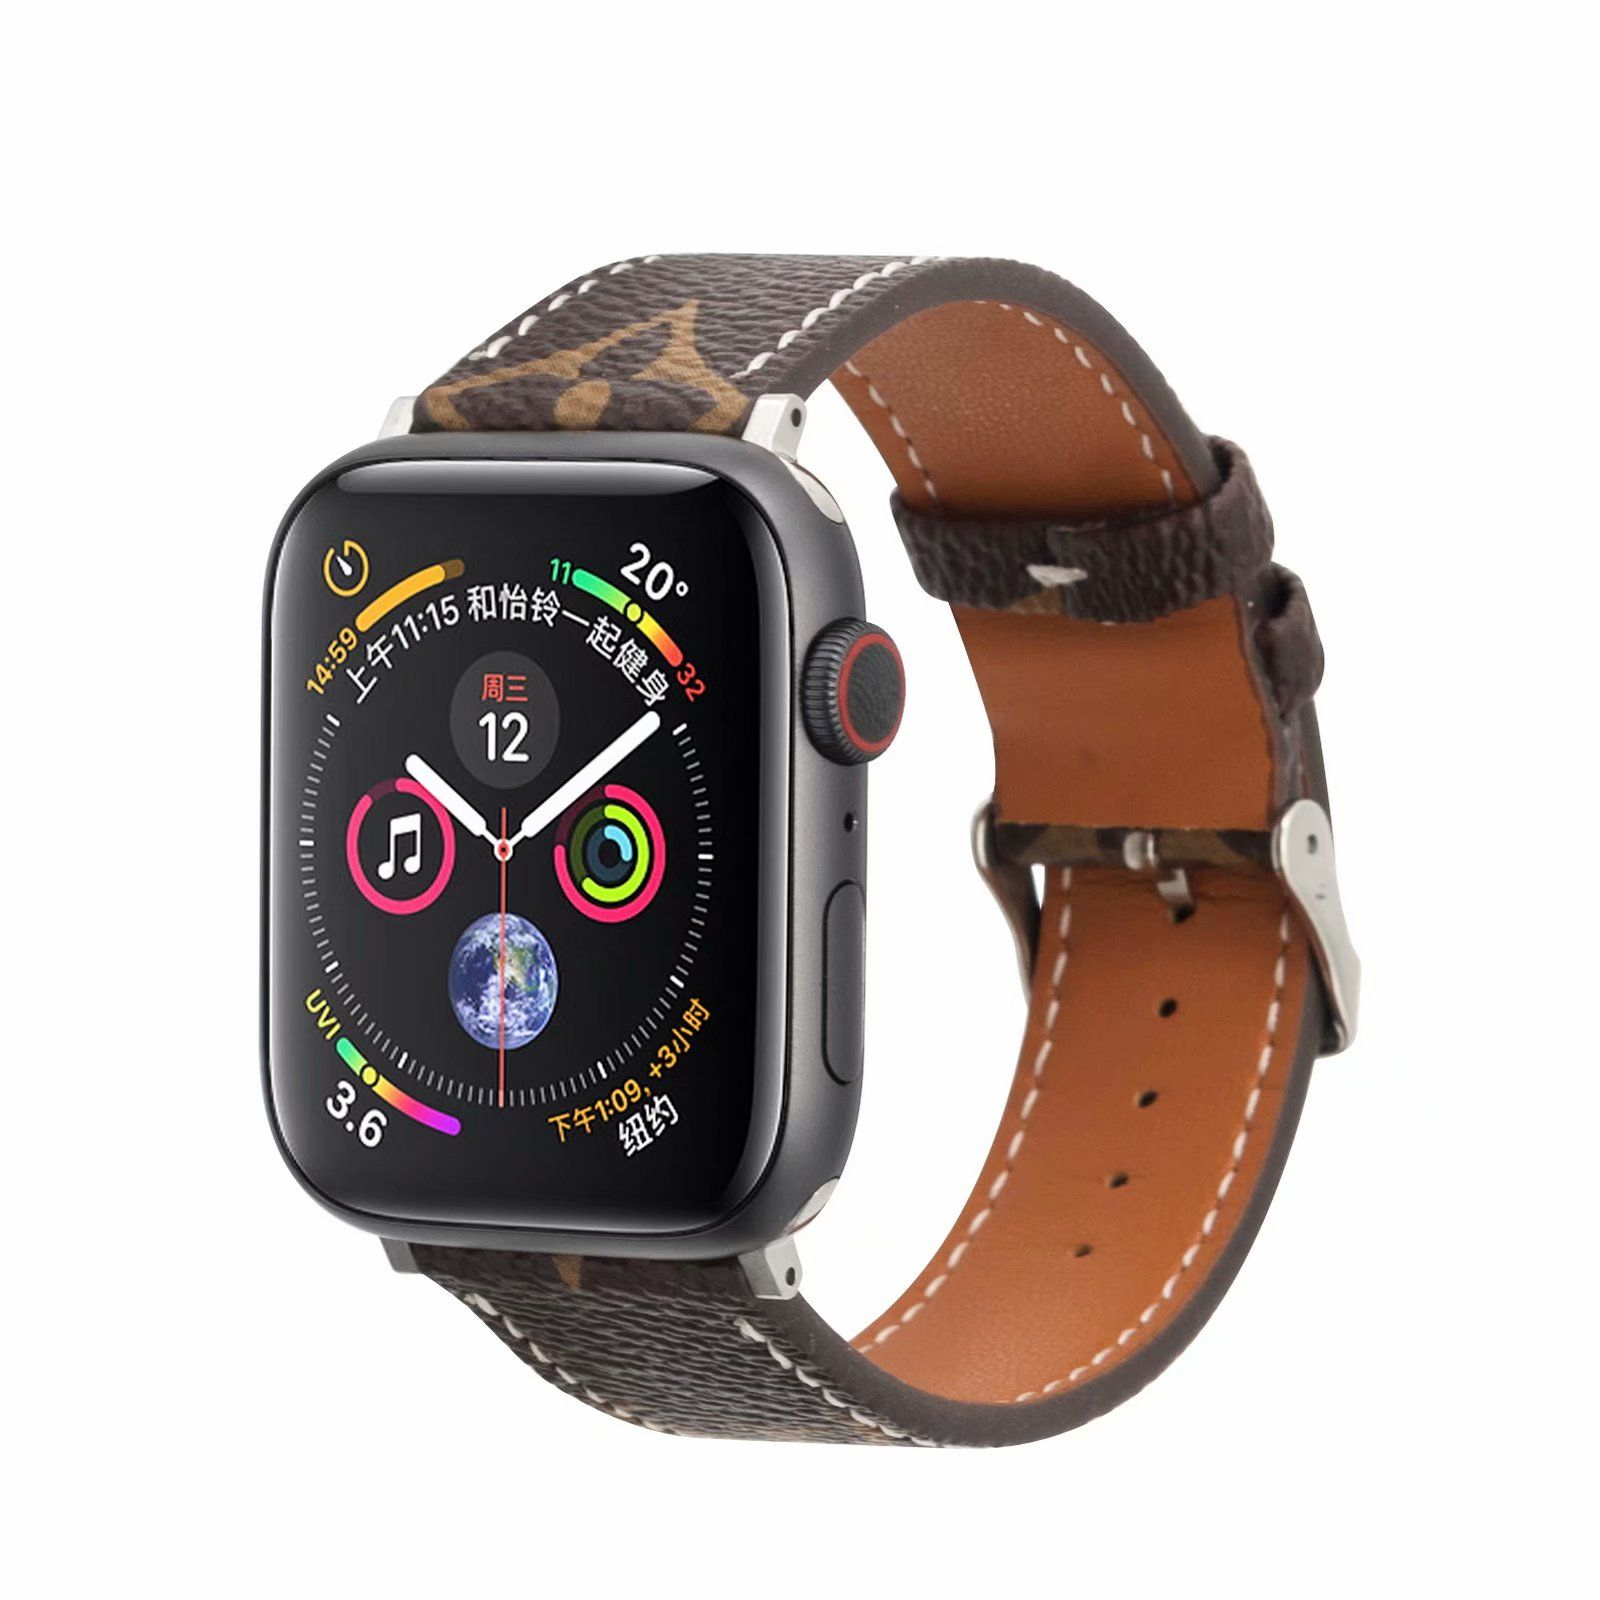 Pin by Procaseme on Apple Watch Bnads Gucci apple watch